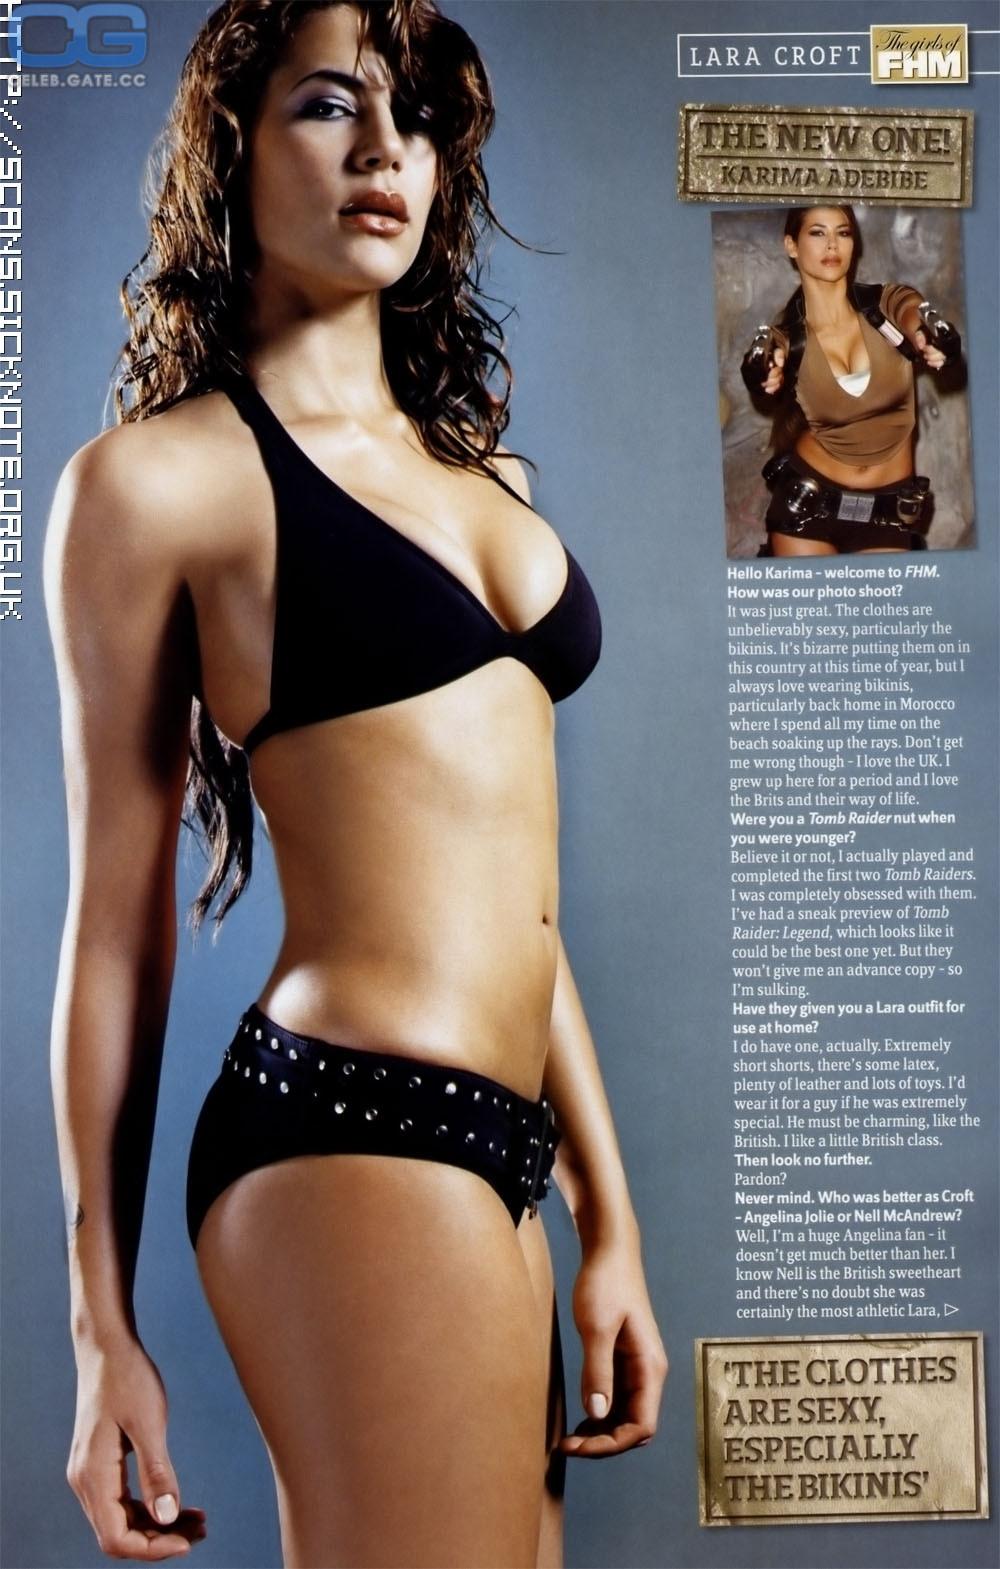 Sexy Karima Adebibe Nude Pictures Jpg